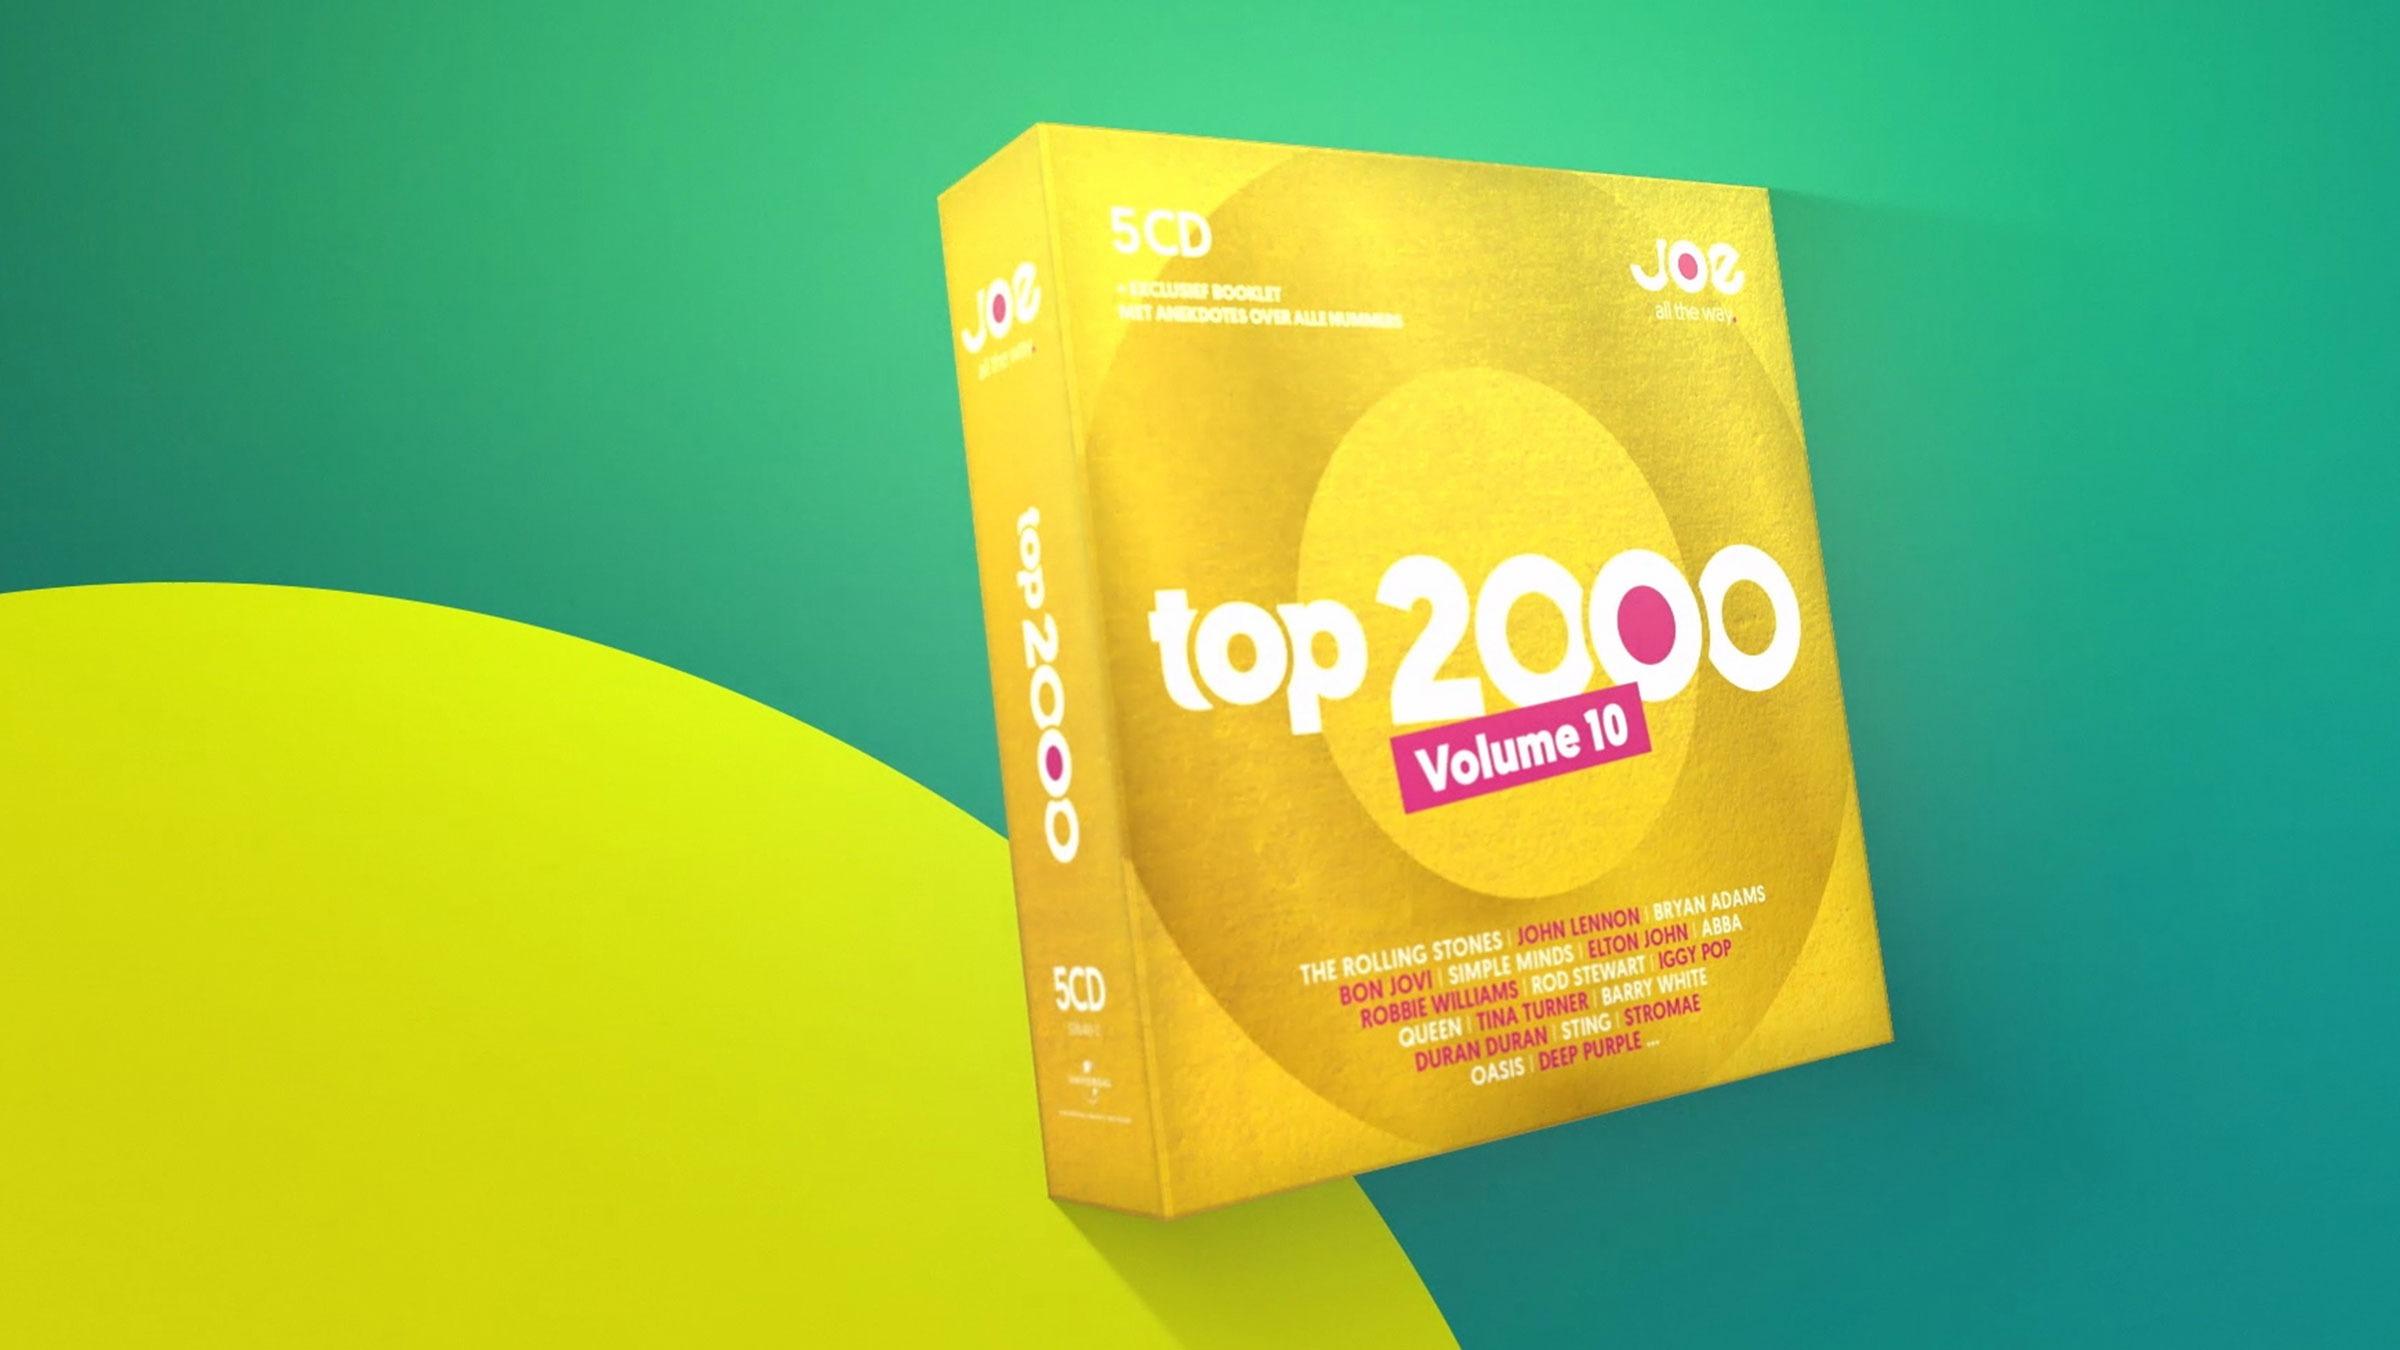 Top2000 cd header